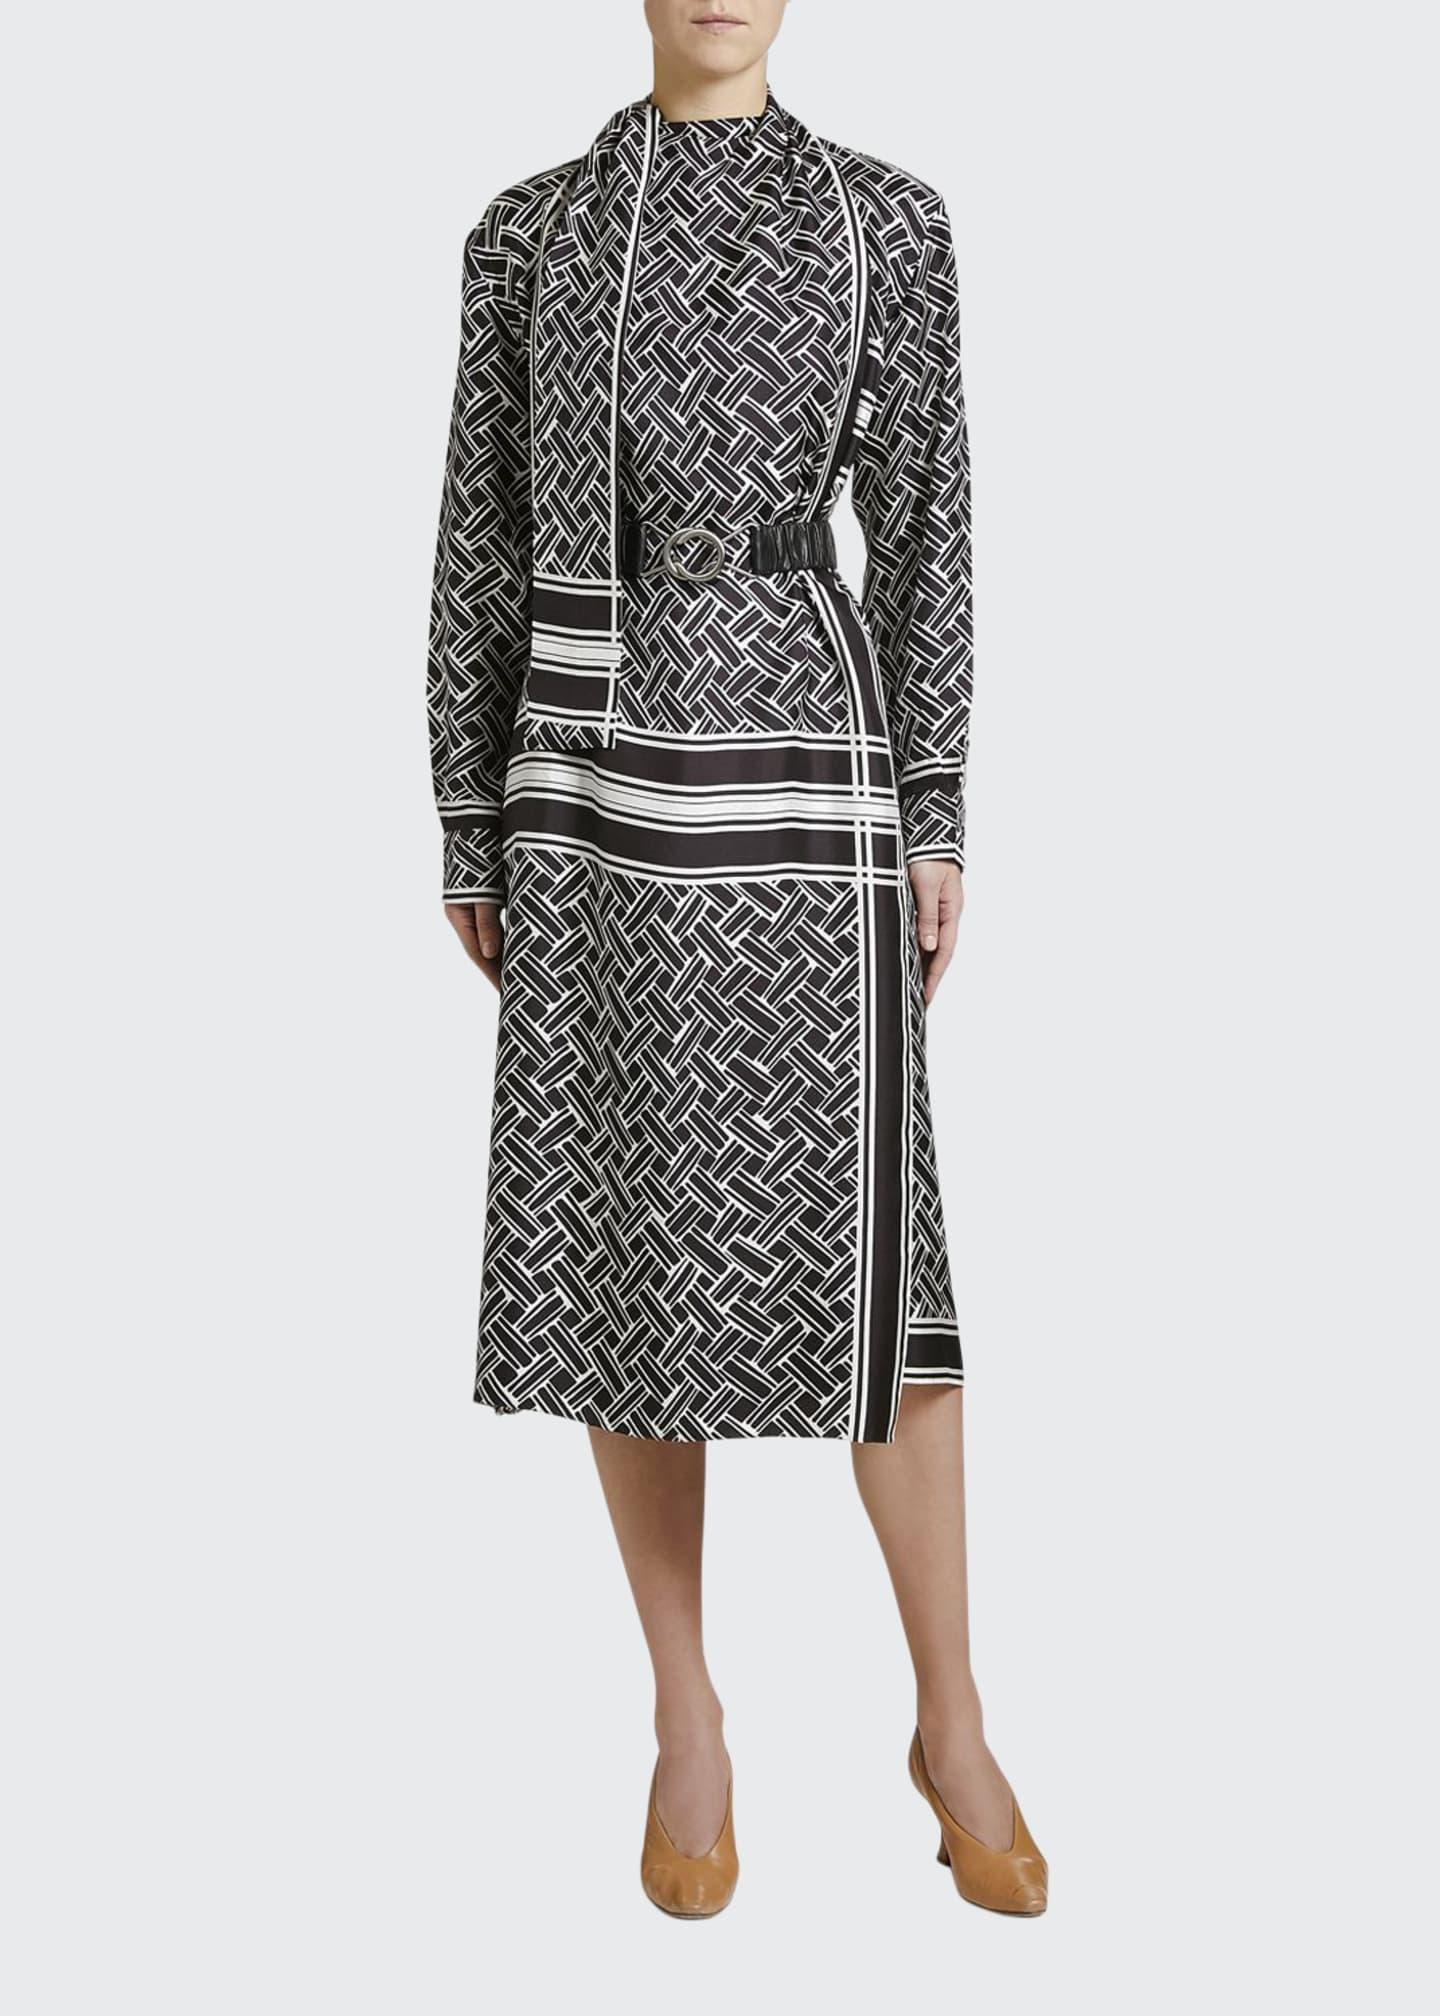 Bottega Veneta Twill Graphic Print Wrap Dress